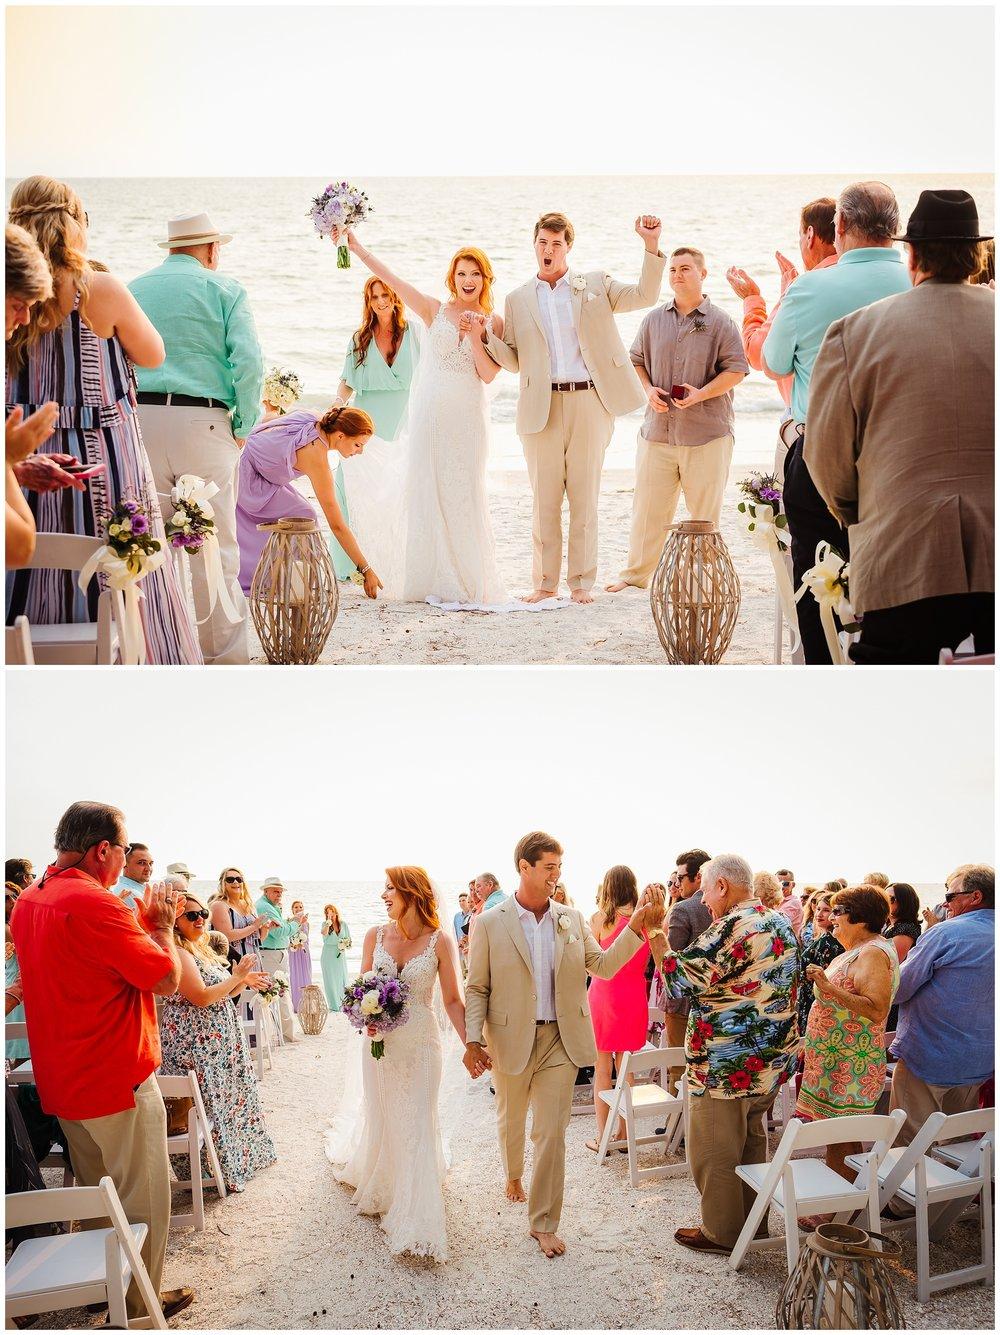 tampa-st-pete-wedding-photographer-indian-rocks-beach-mermaid-train-redhead_0139.jpg